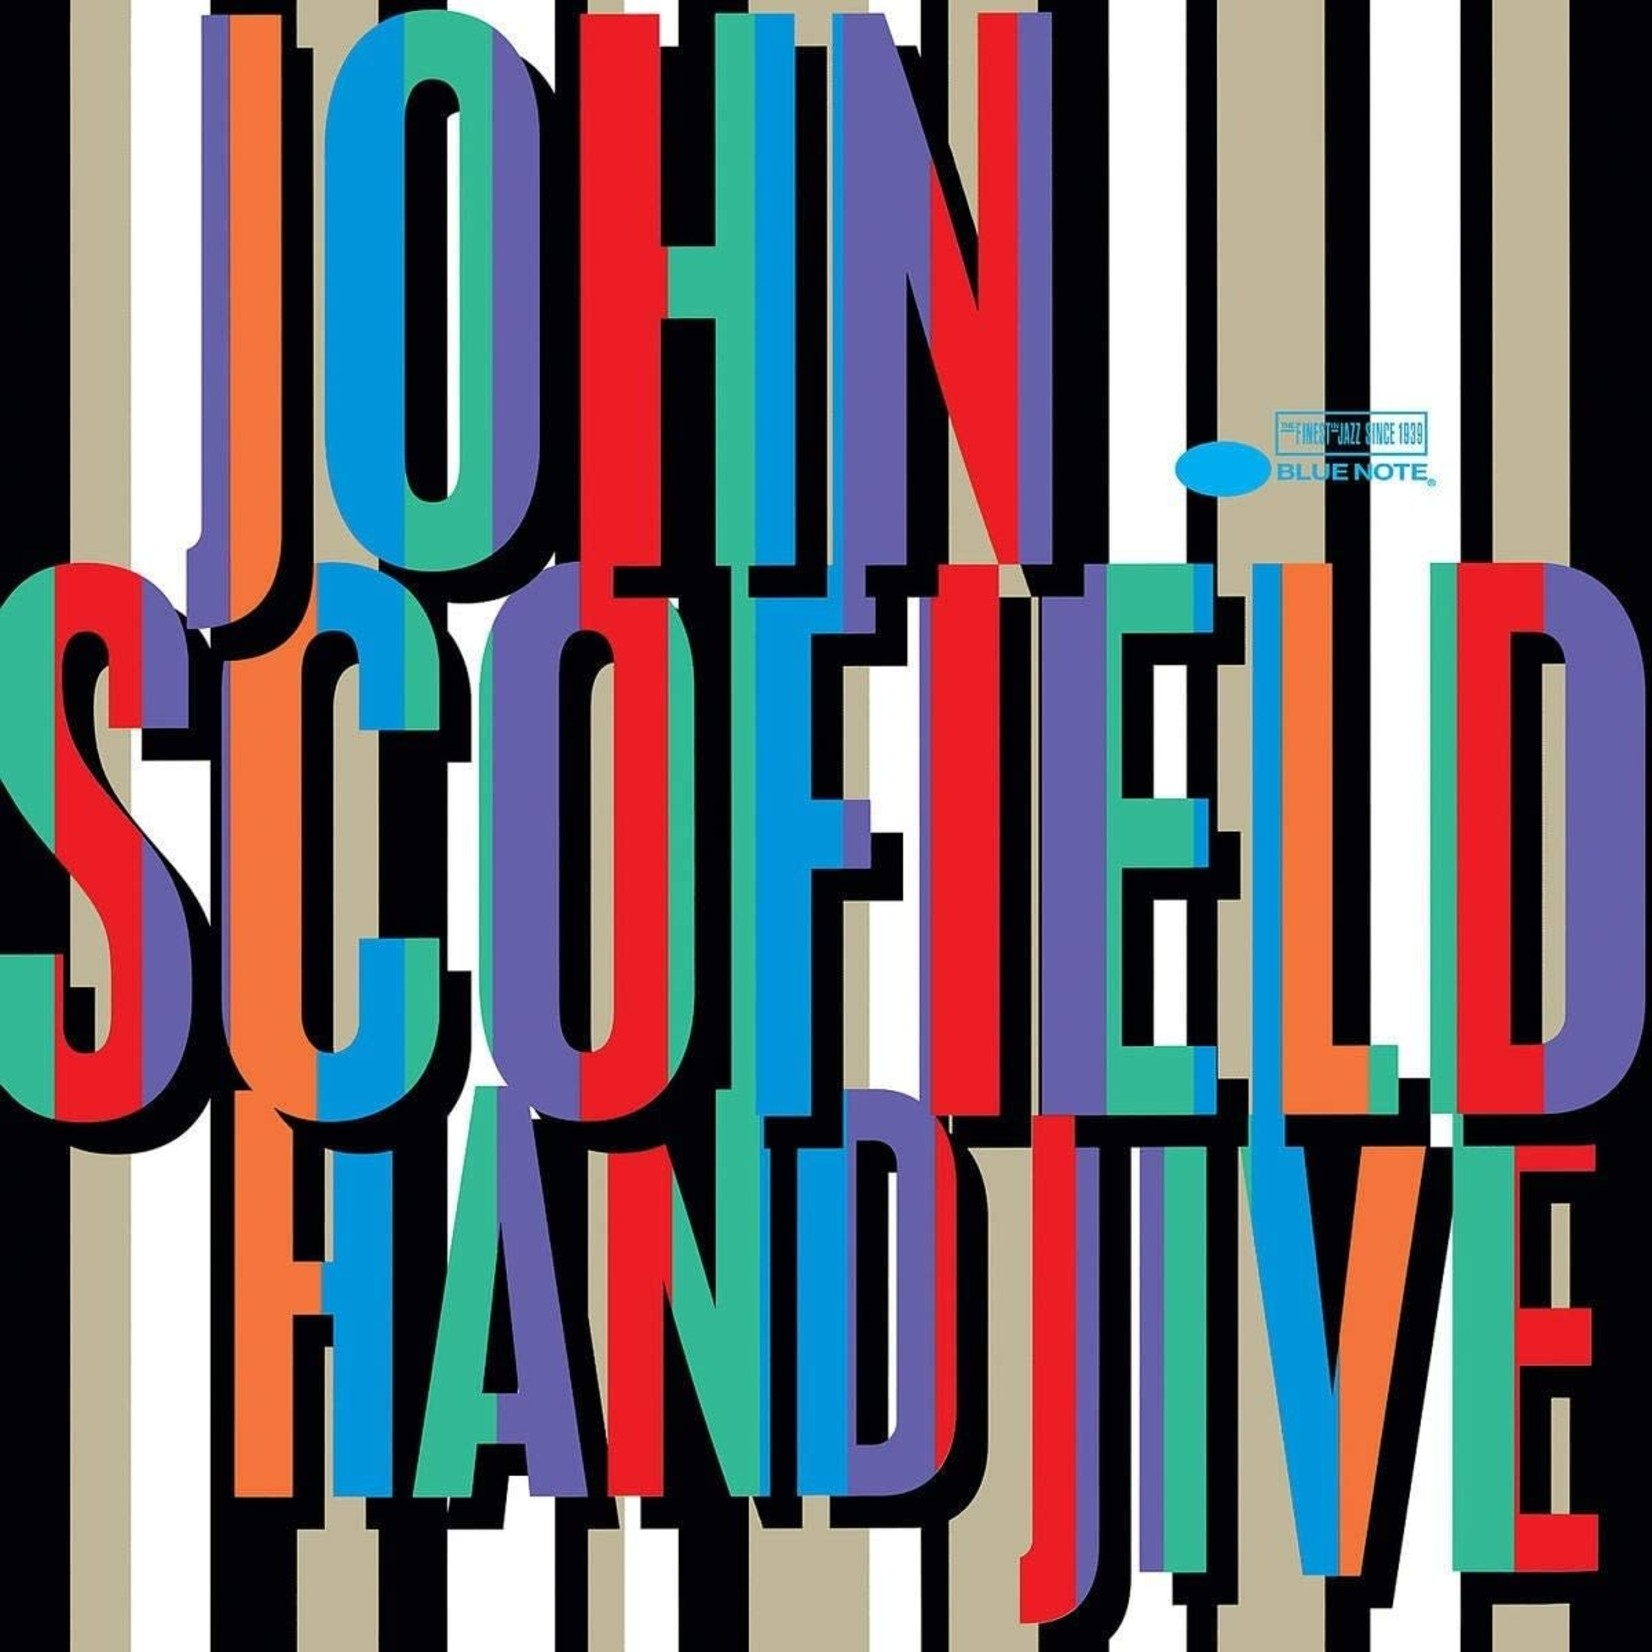 [New] Scofield, John: Hand Jive (Blue Note 80 Series) (2LP)